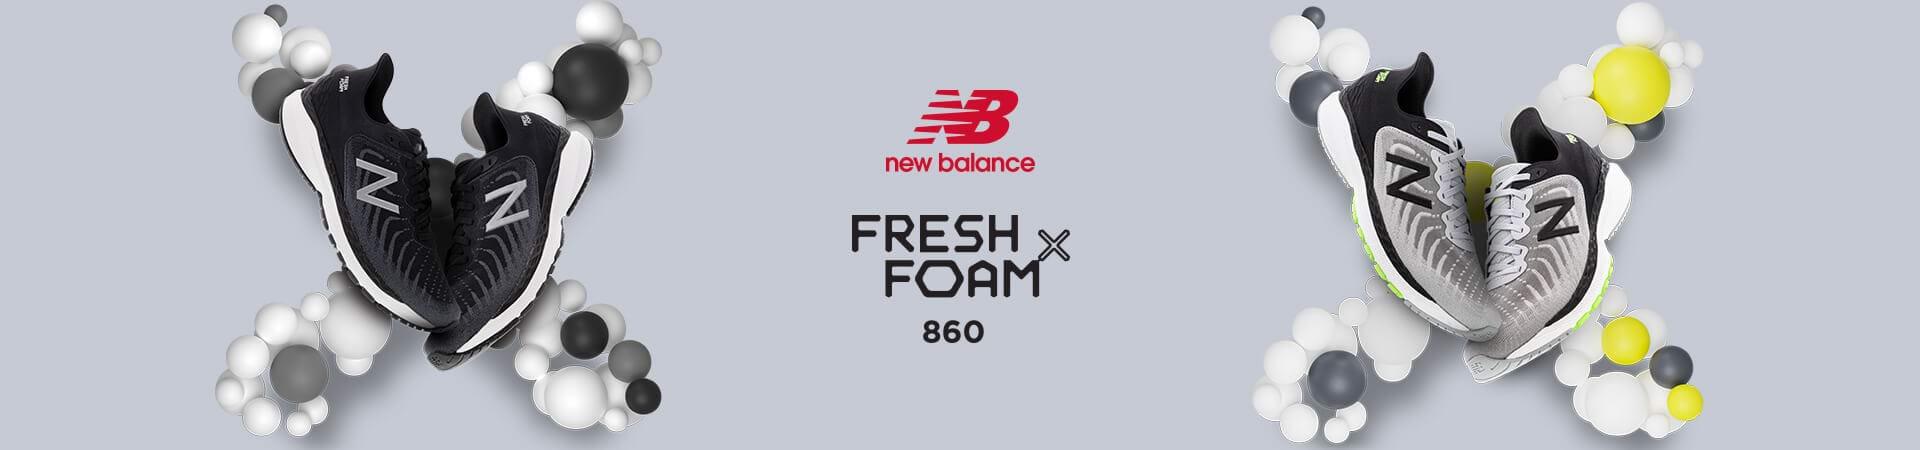 New Balance 860 running shoes